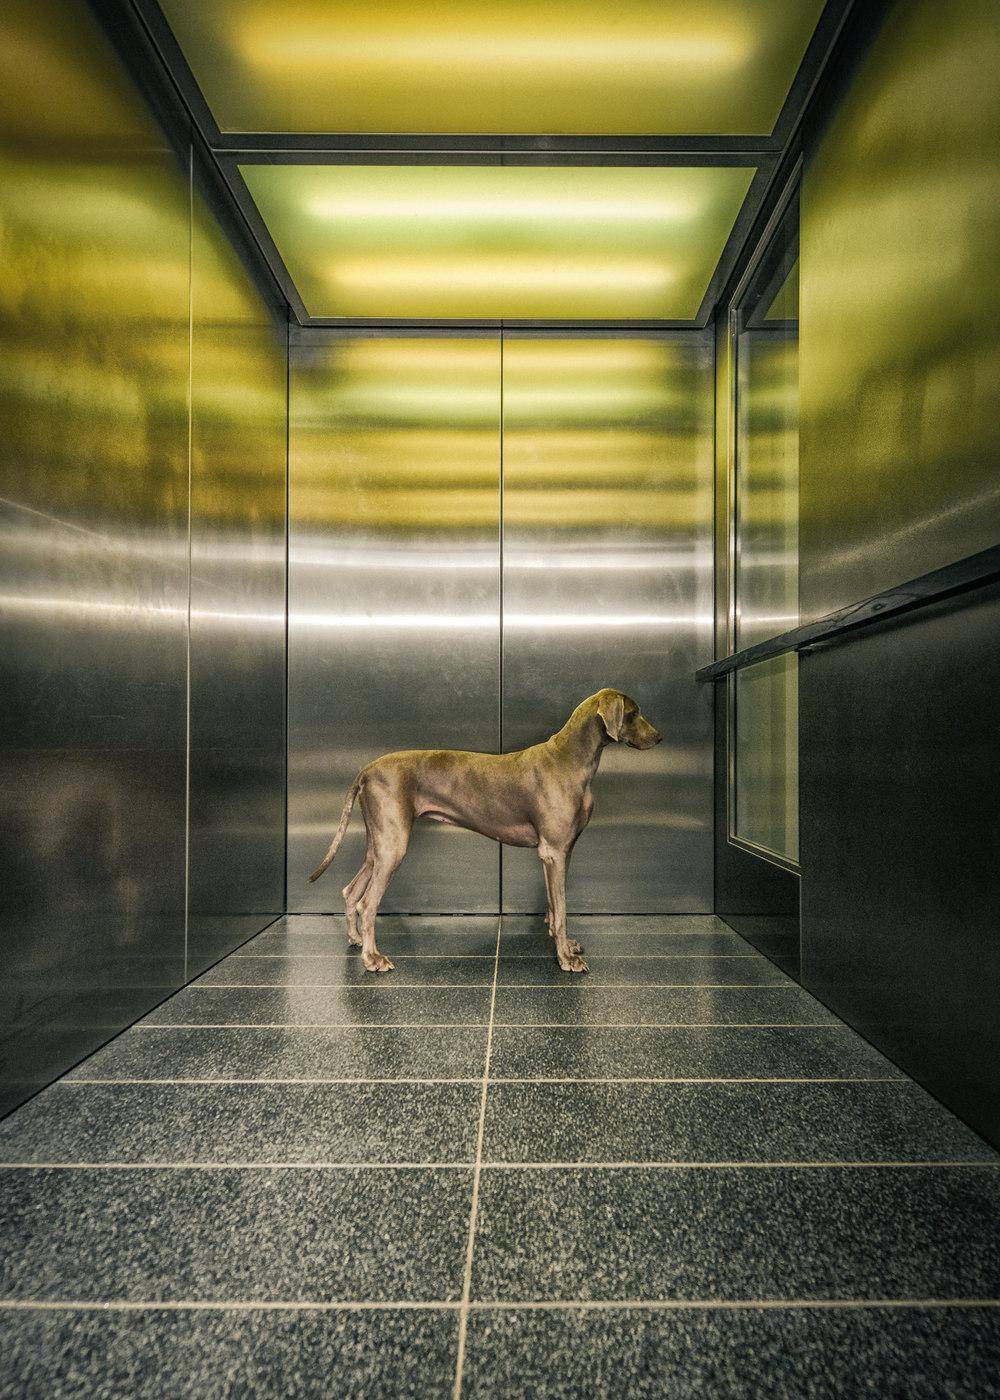 outdoor-dogs-klausdyba-5.jpg